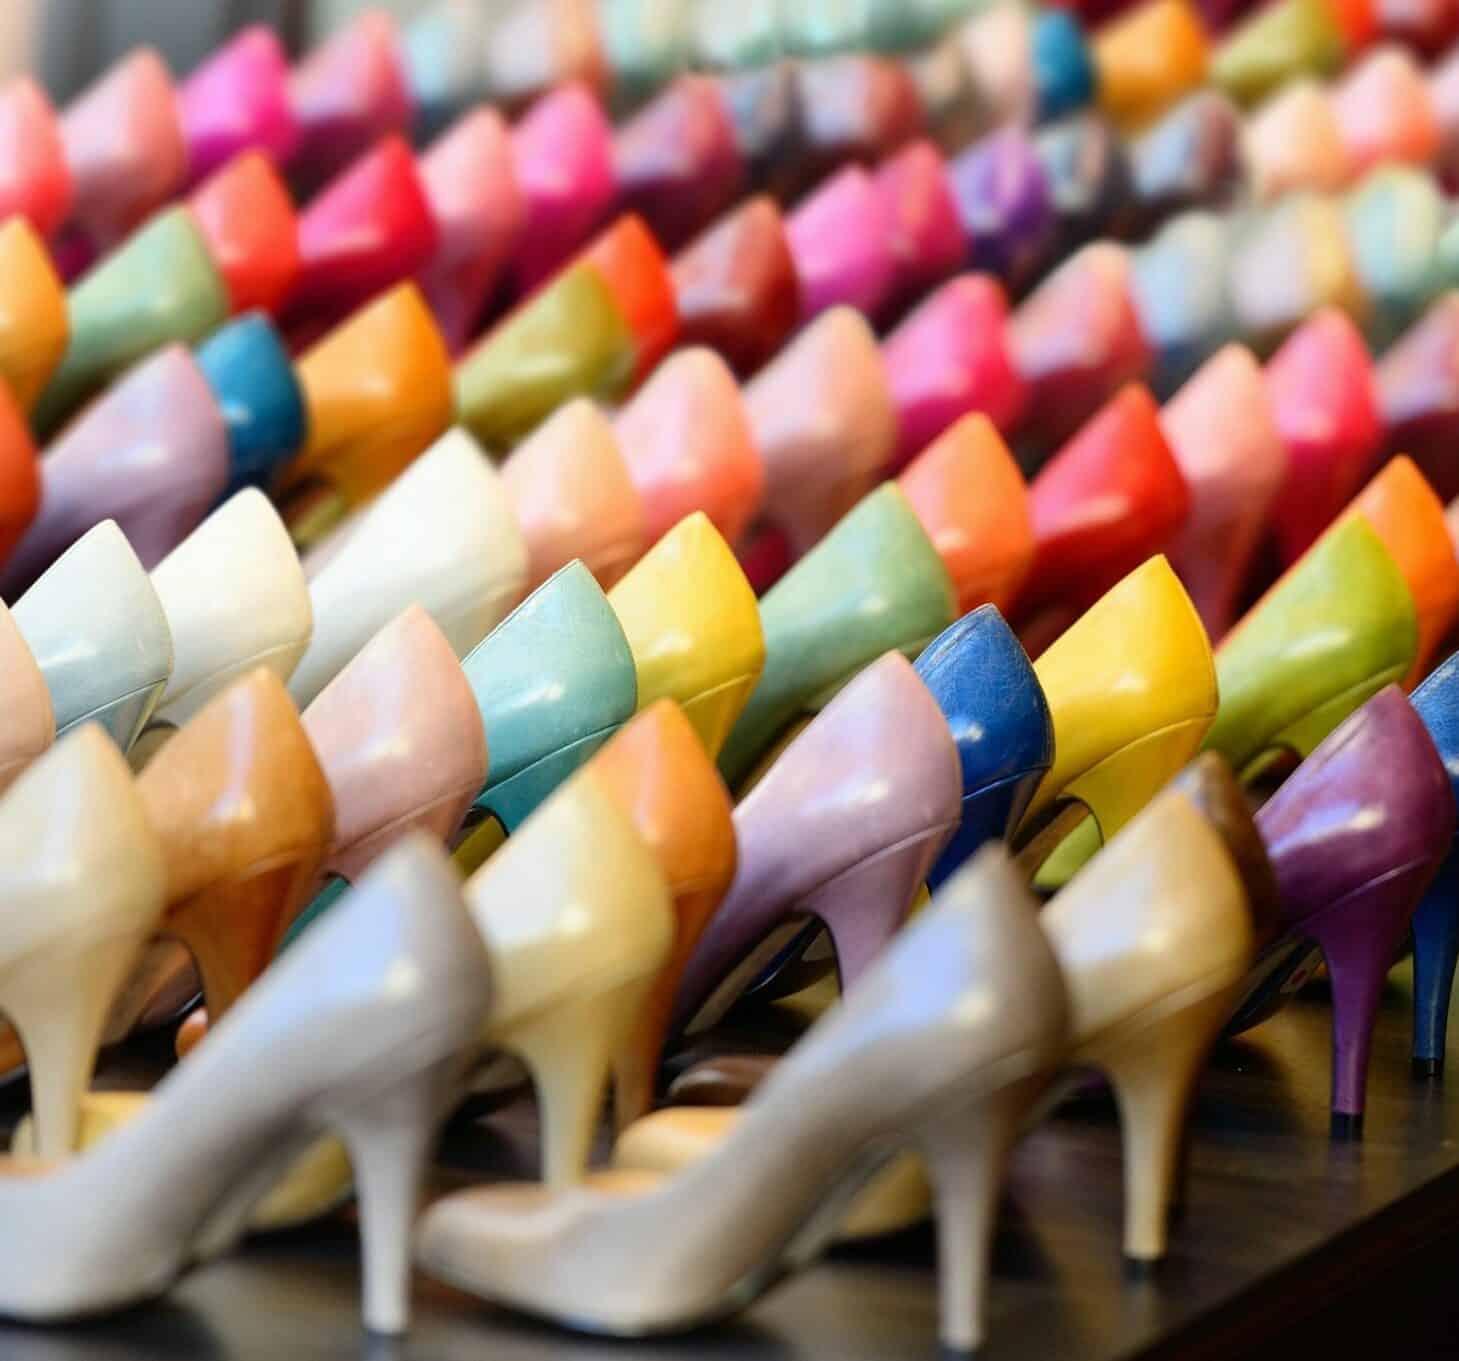 Pastel colored shoes